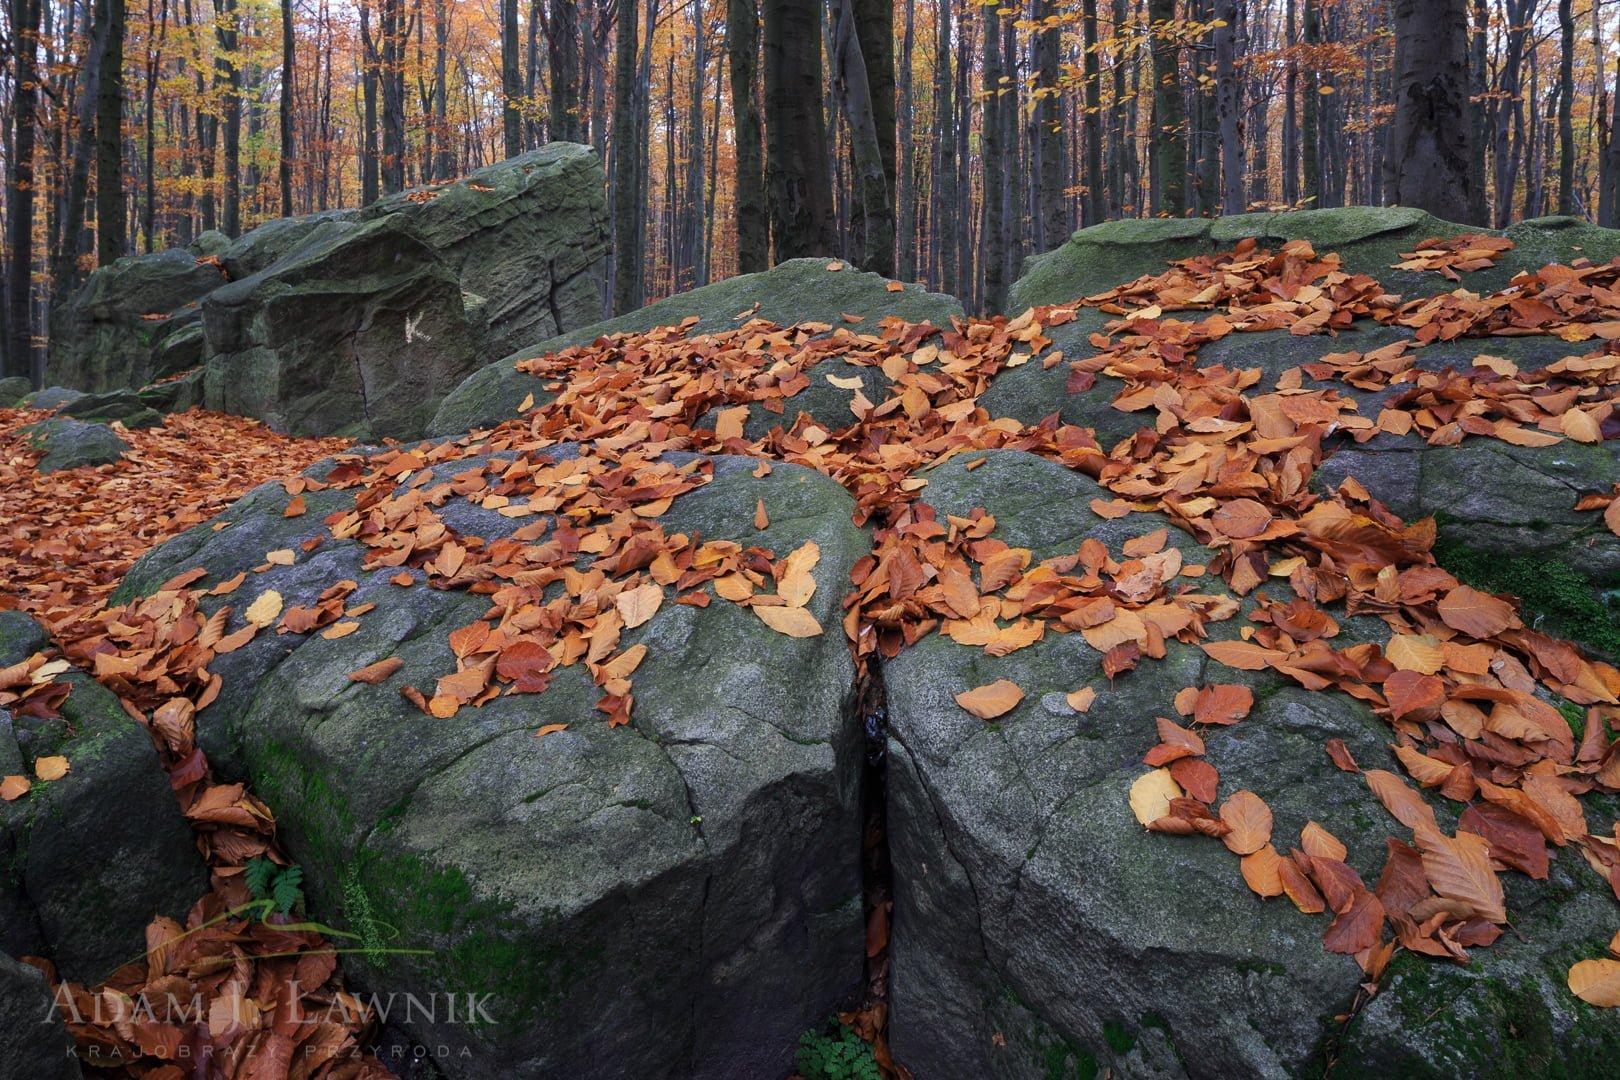 Świętokrzyski National Park, Poland 1310-01301C